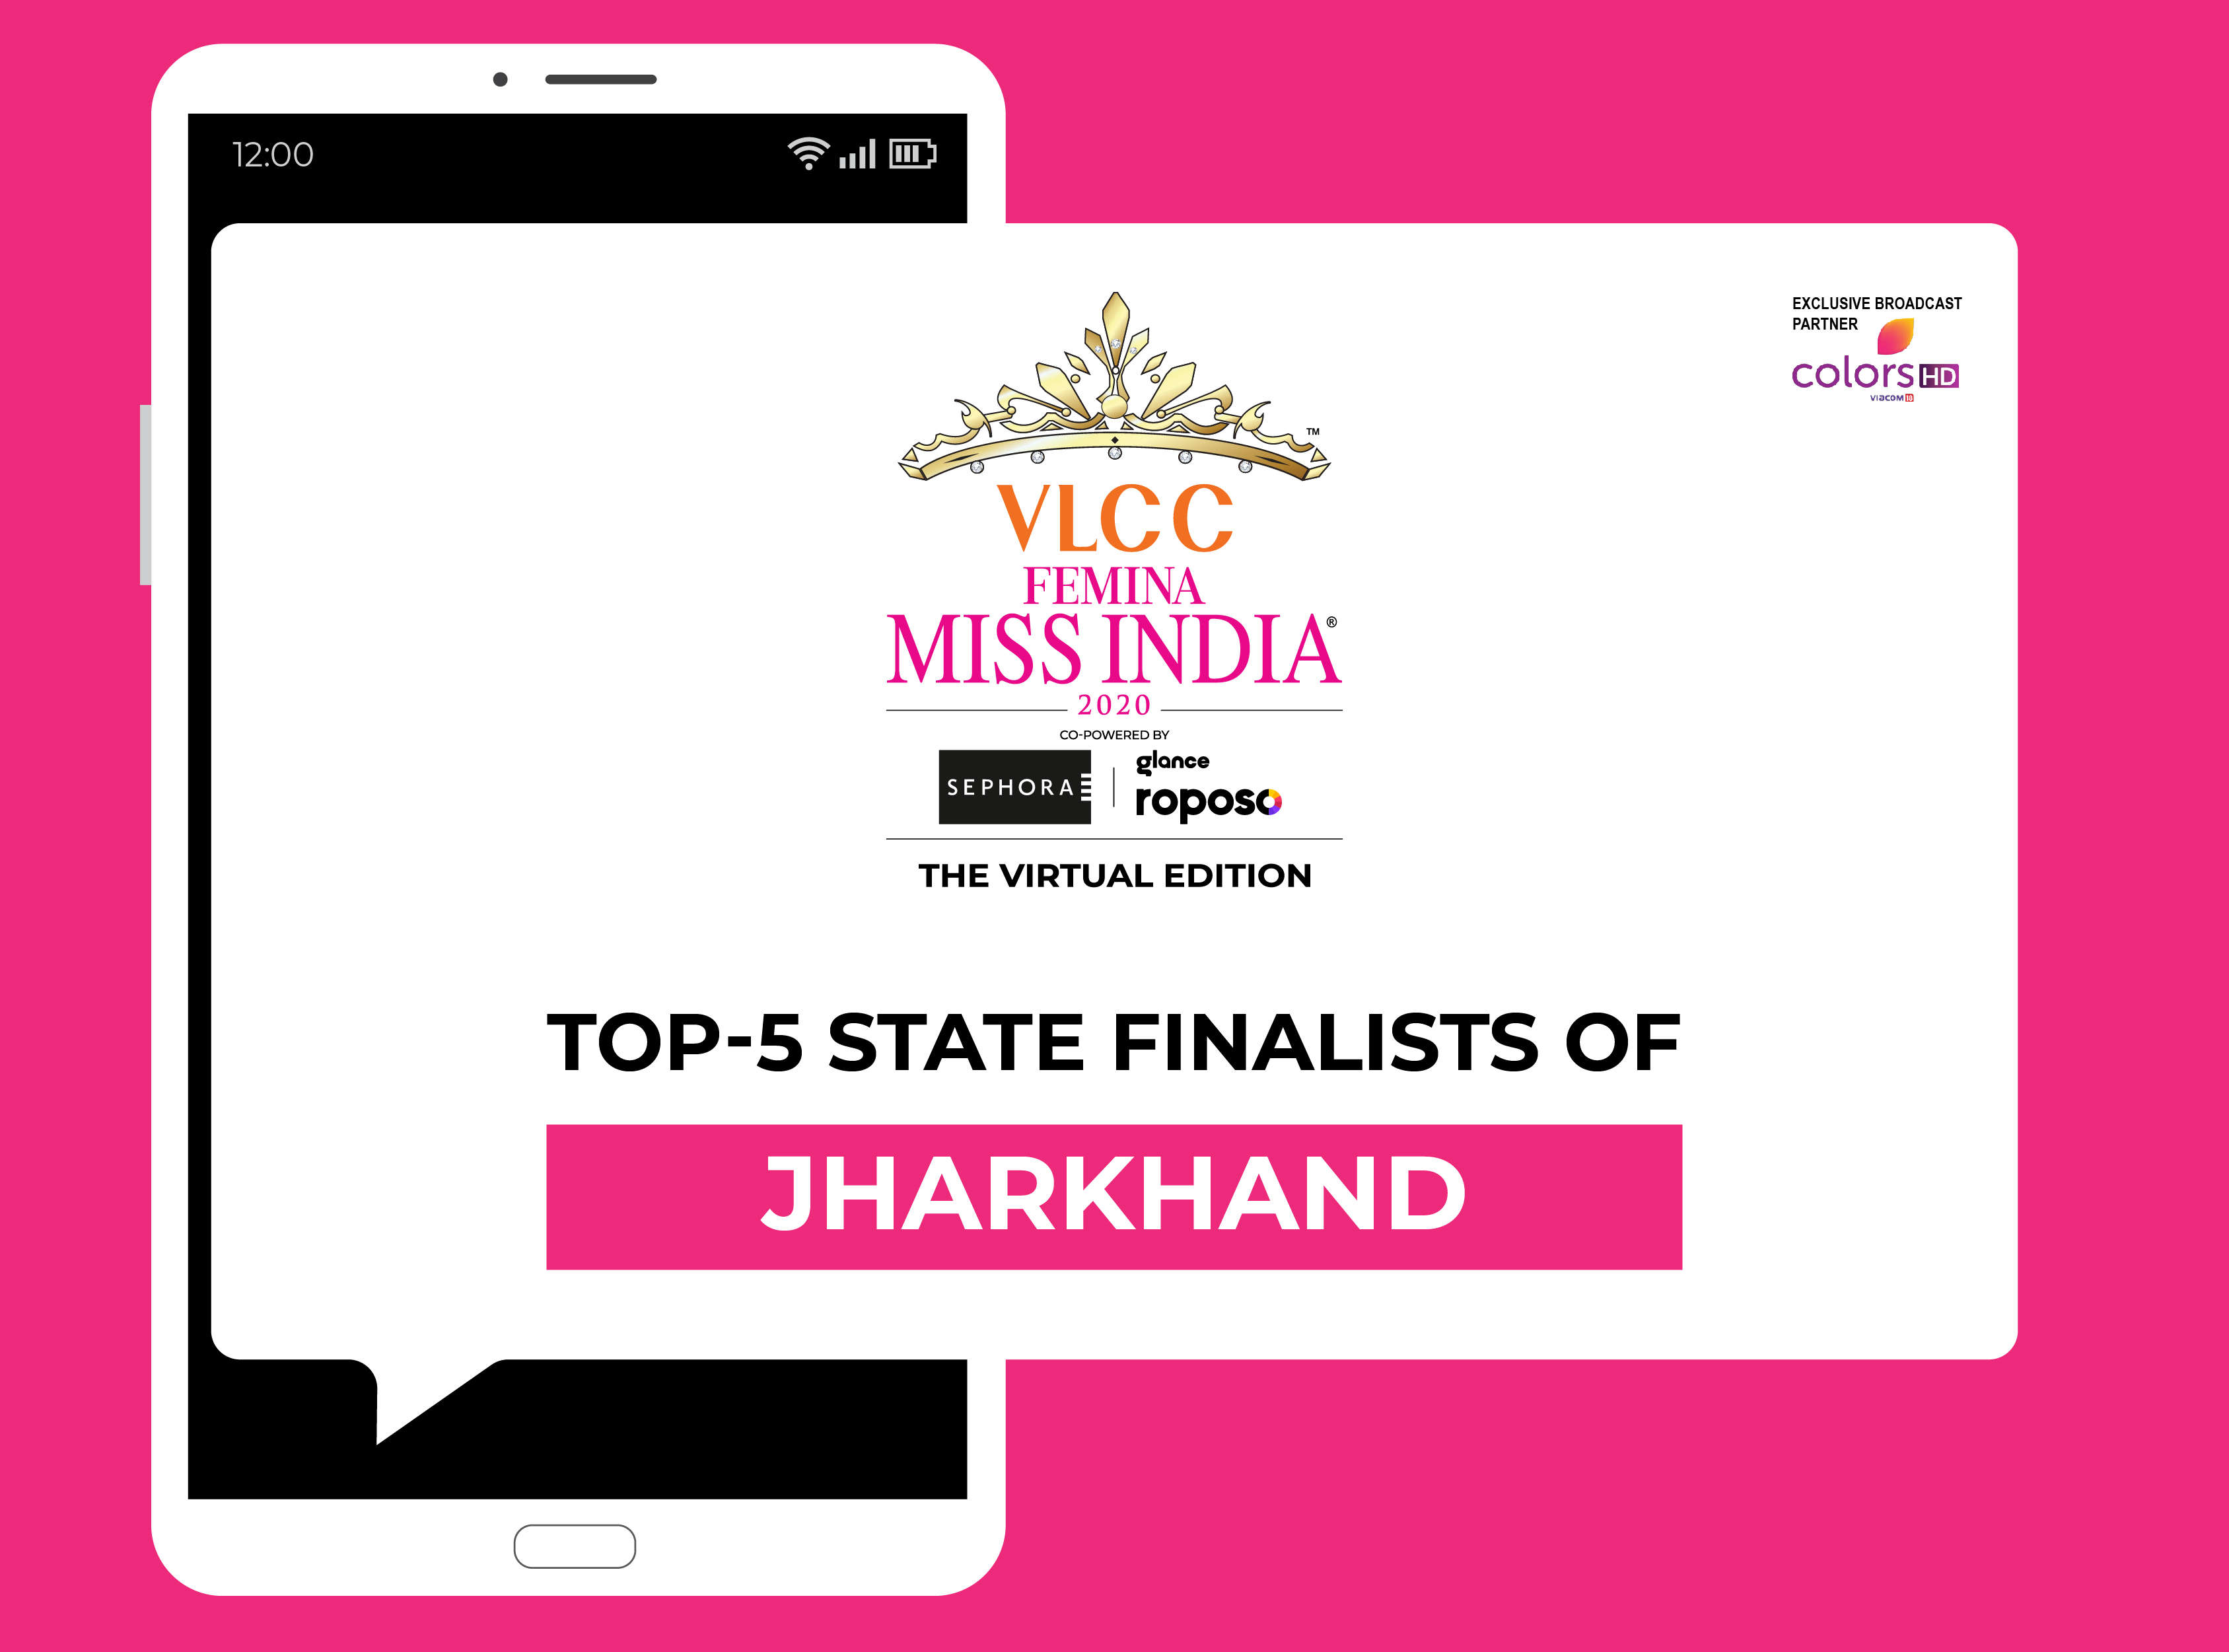 Introducing VLCC Femina Miss India Jharkhand 2020 Finalists!